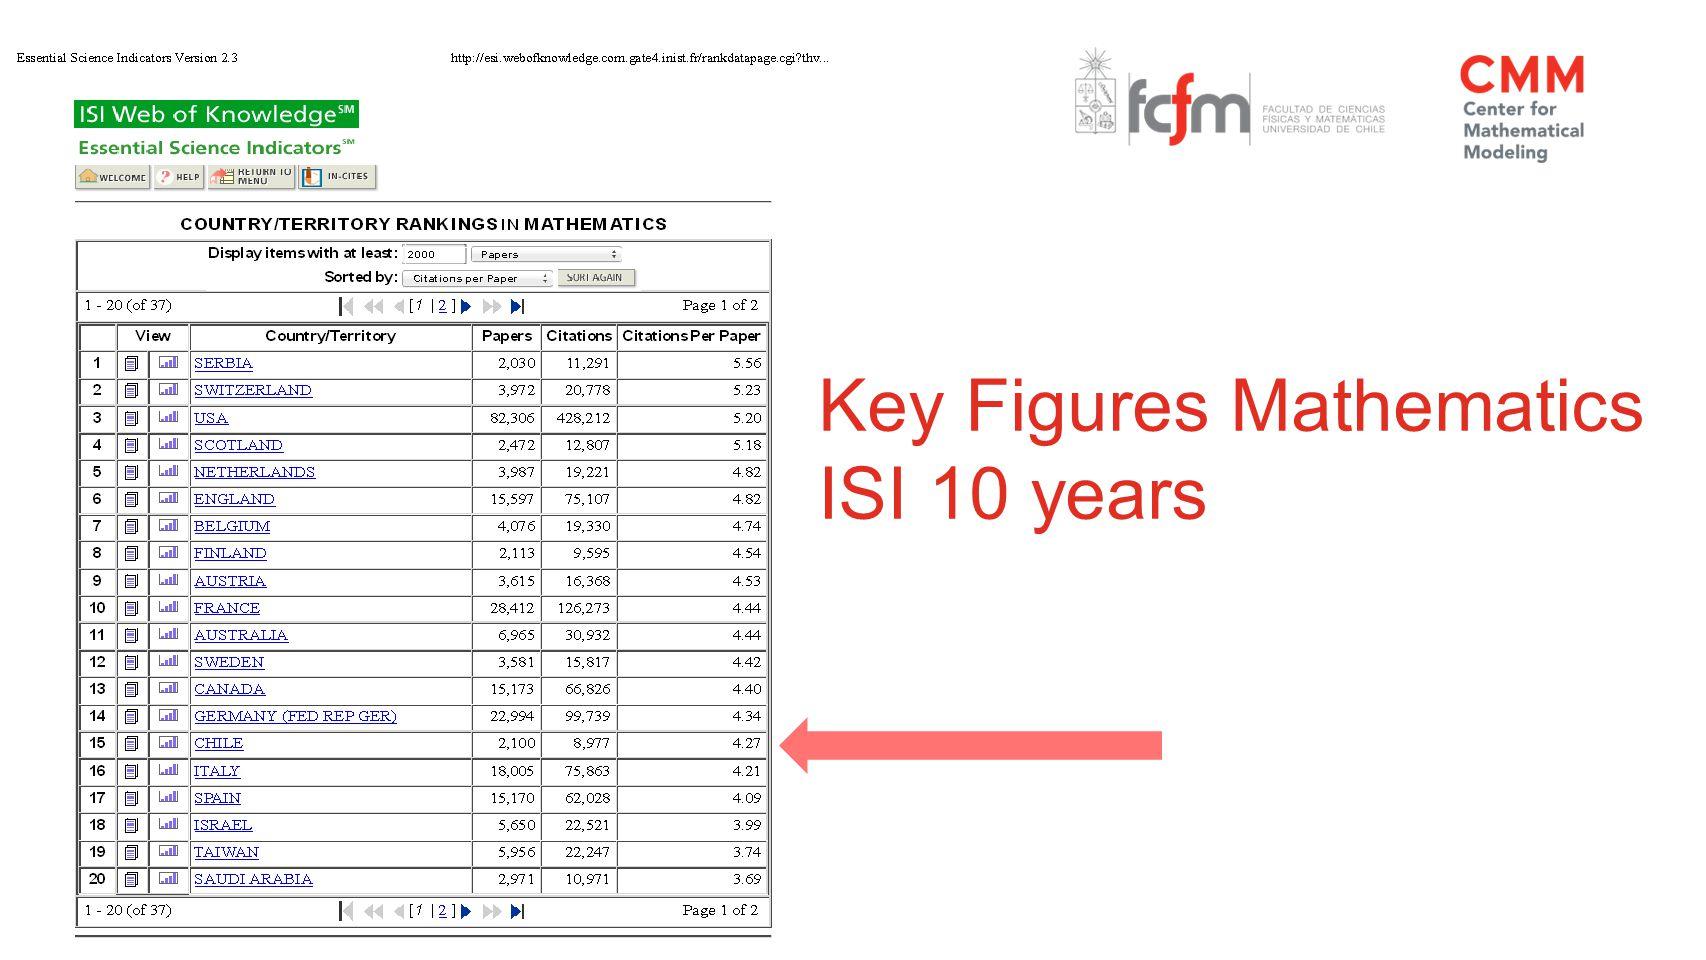 Key Figures Mathematics ISI 10 years